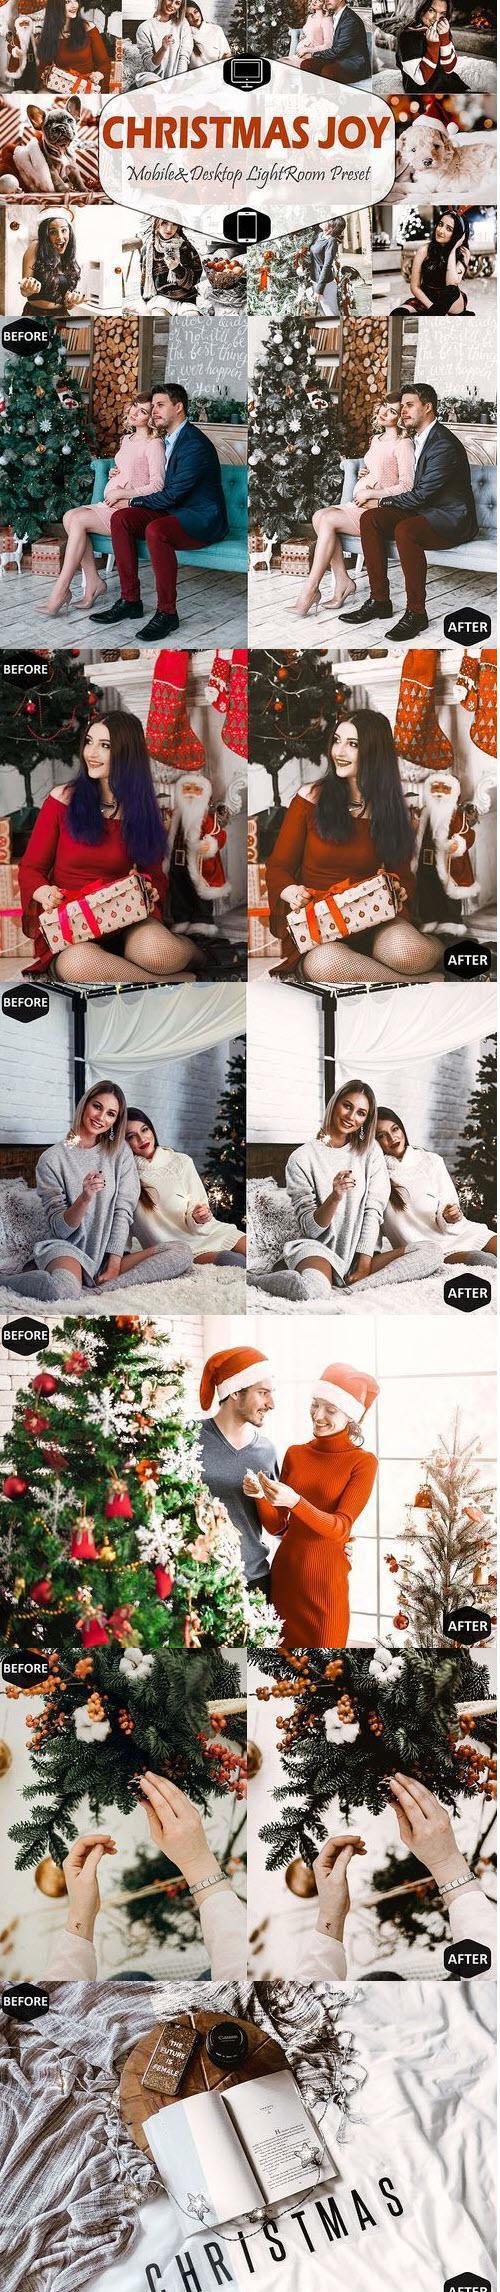 Christmas Joy Mobile & Desktop Lightroom Presets, brown Xmas - 404949